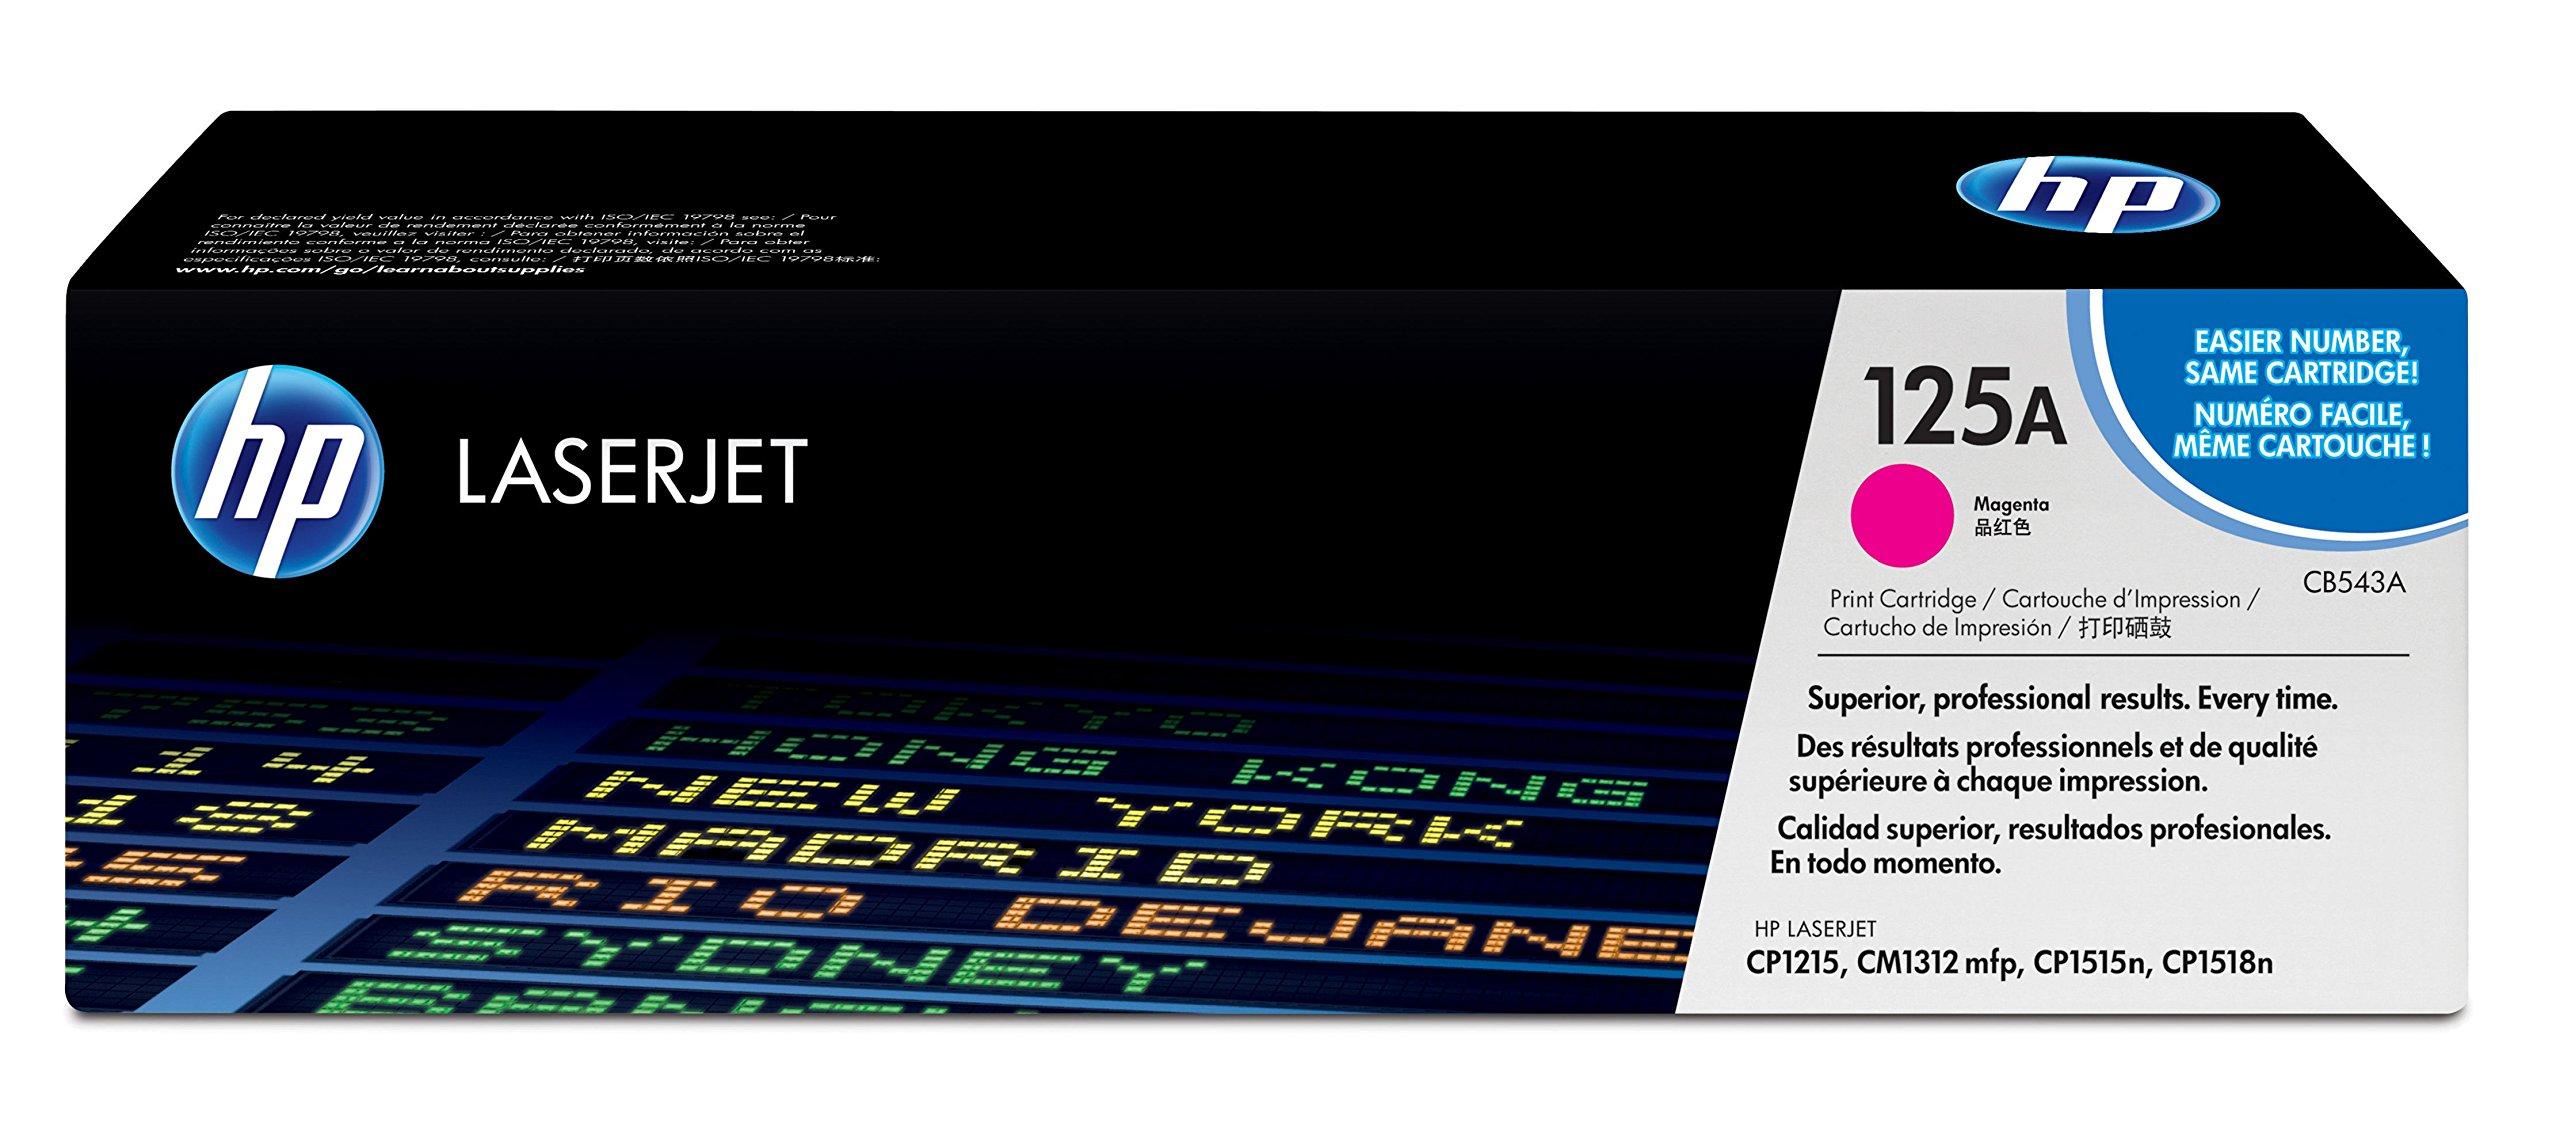 HP 125A (CB543A) Magenta Original Toner Cartridge for HP Color LaserJet CP1215 CP1515 CP1518 CM1312